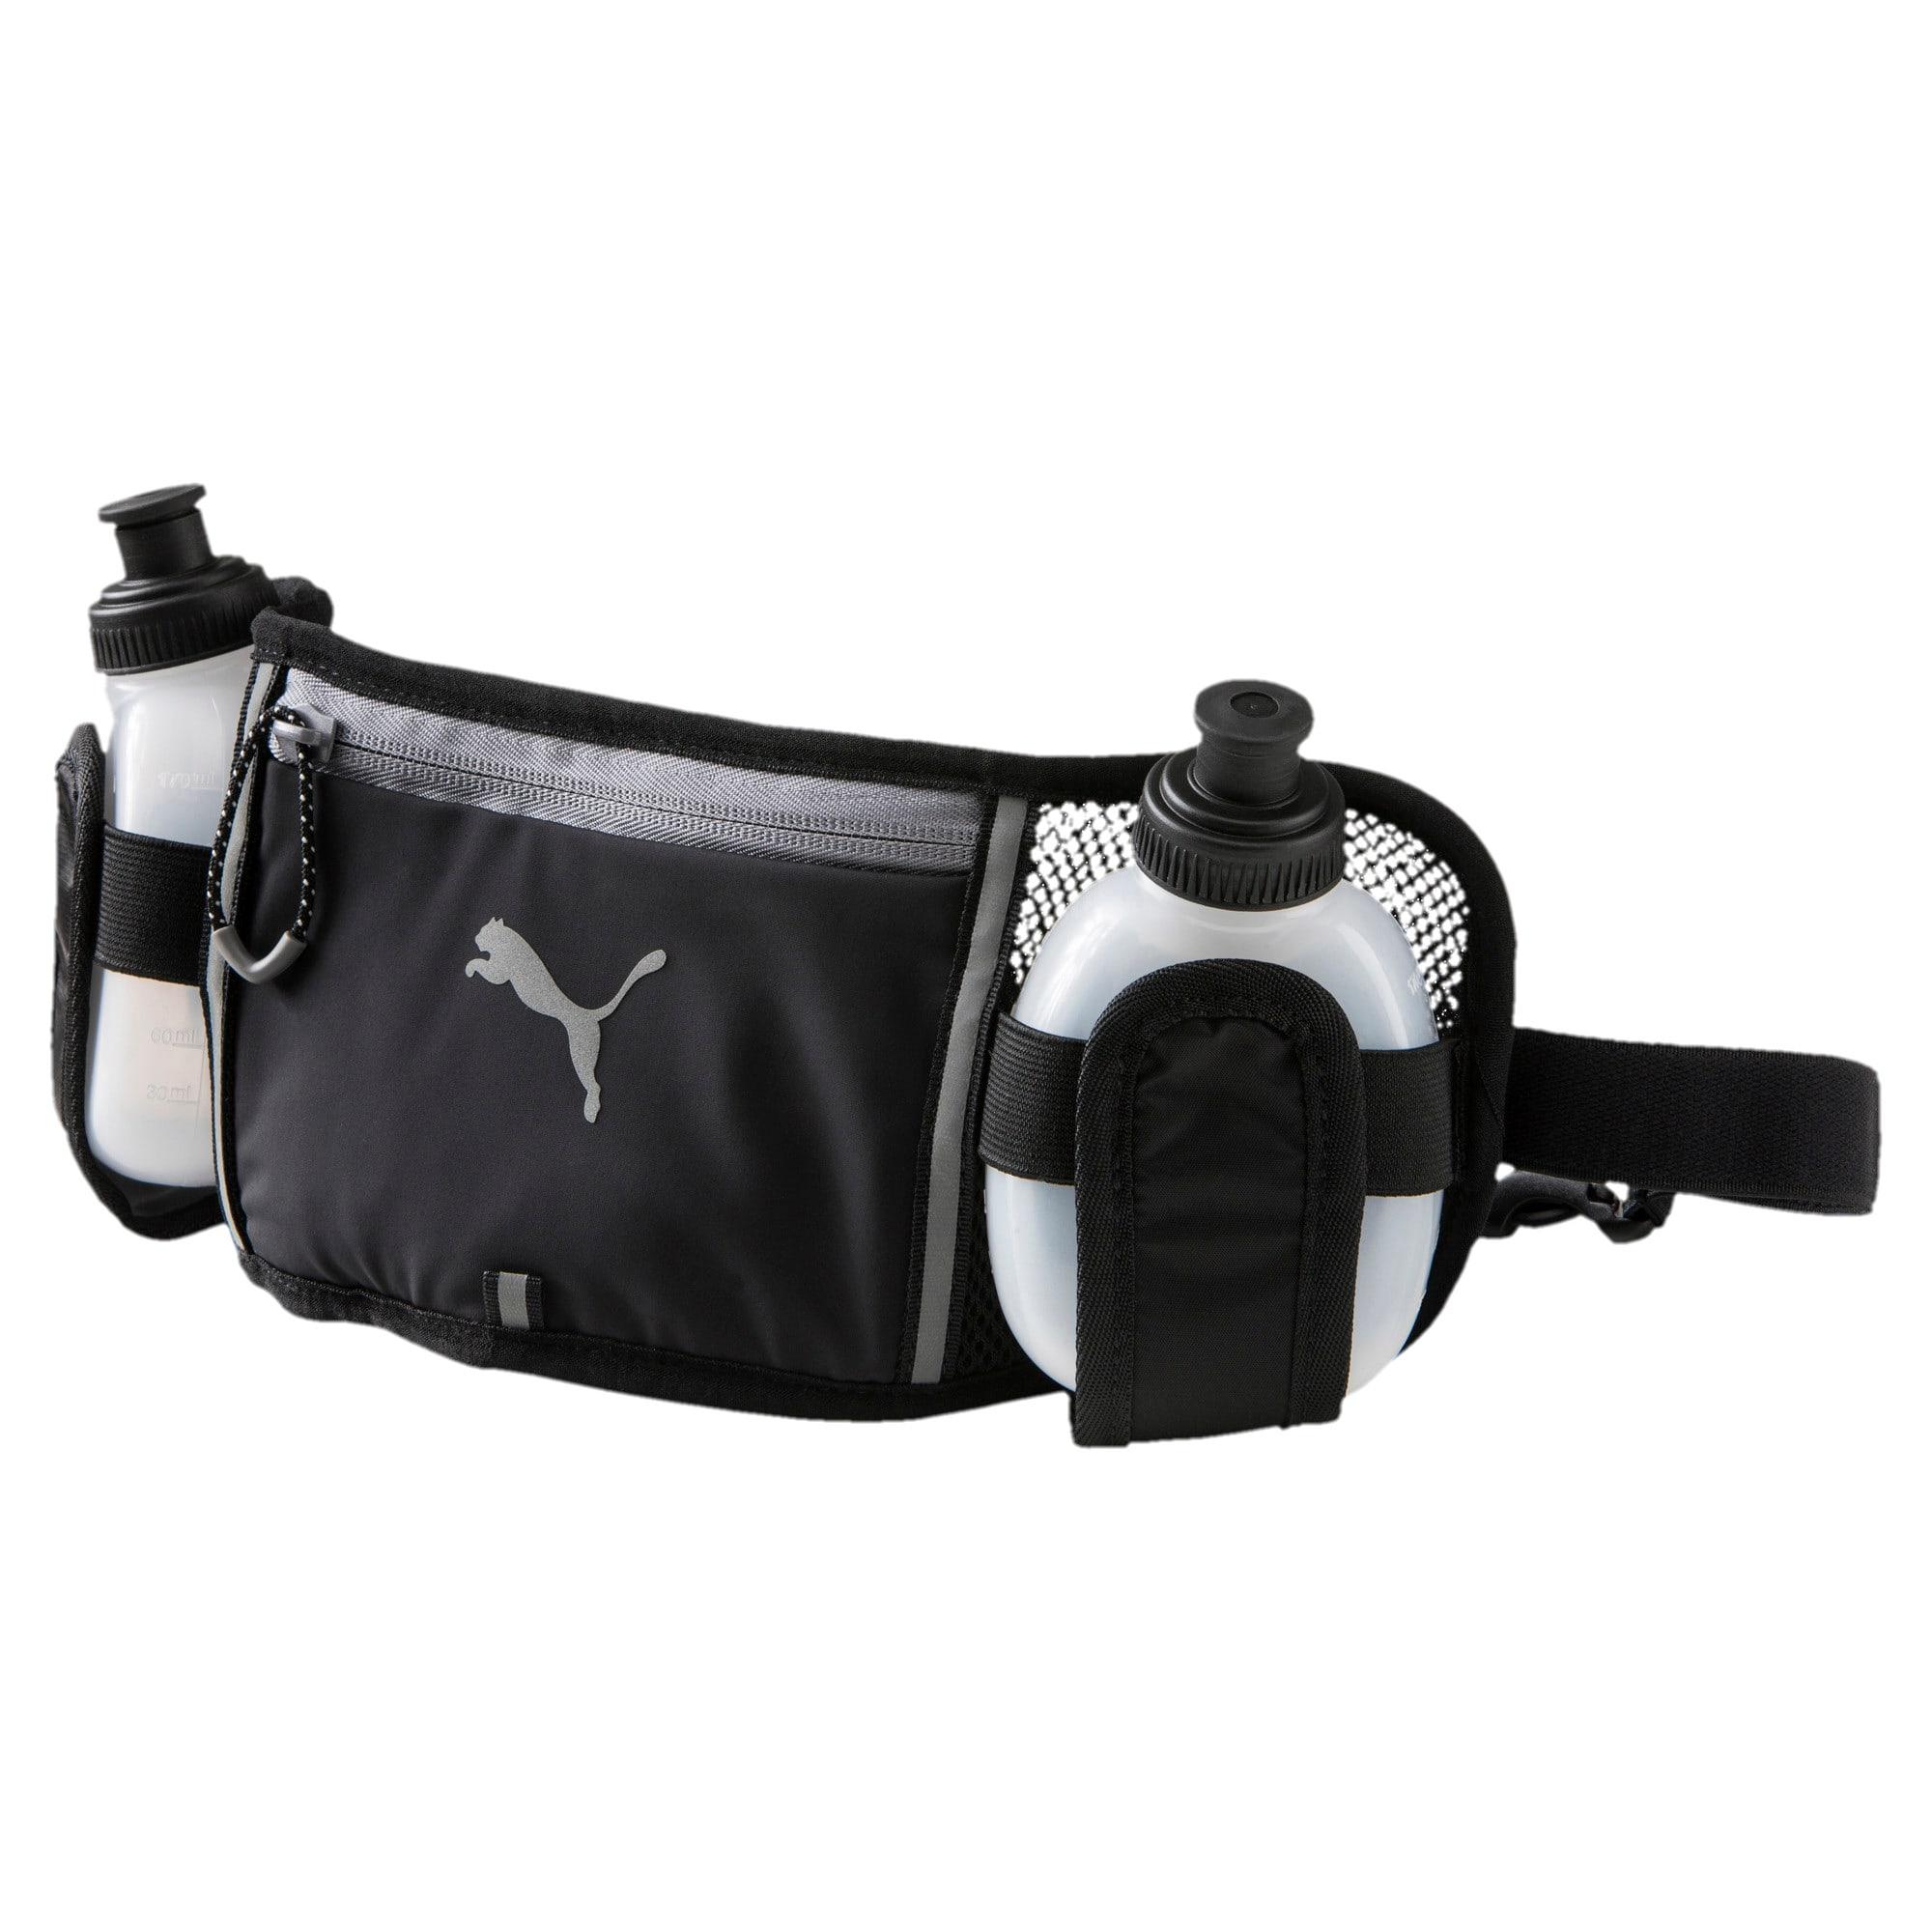 Thumbnail 1 of Running Bottle Waist Bag, Puma Black-QUIET SHADE, medium-IND